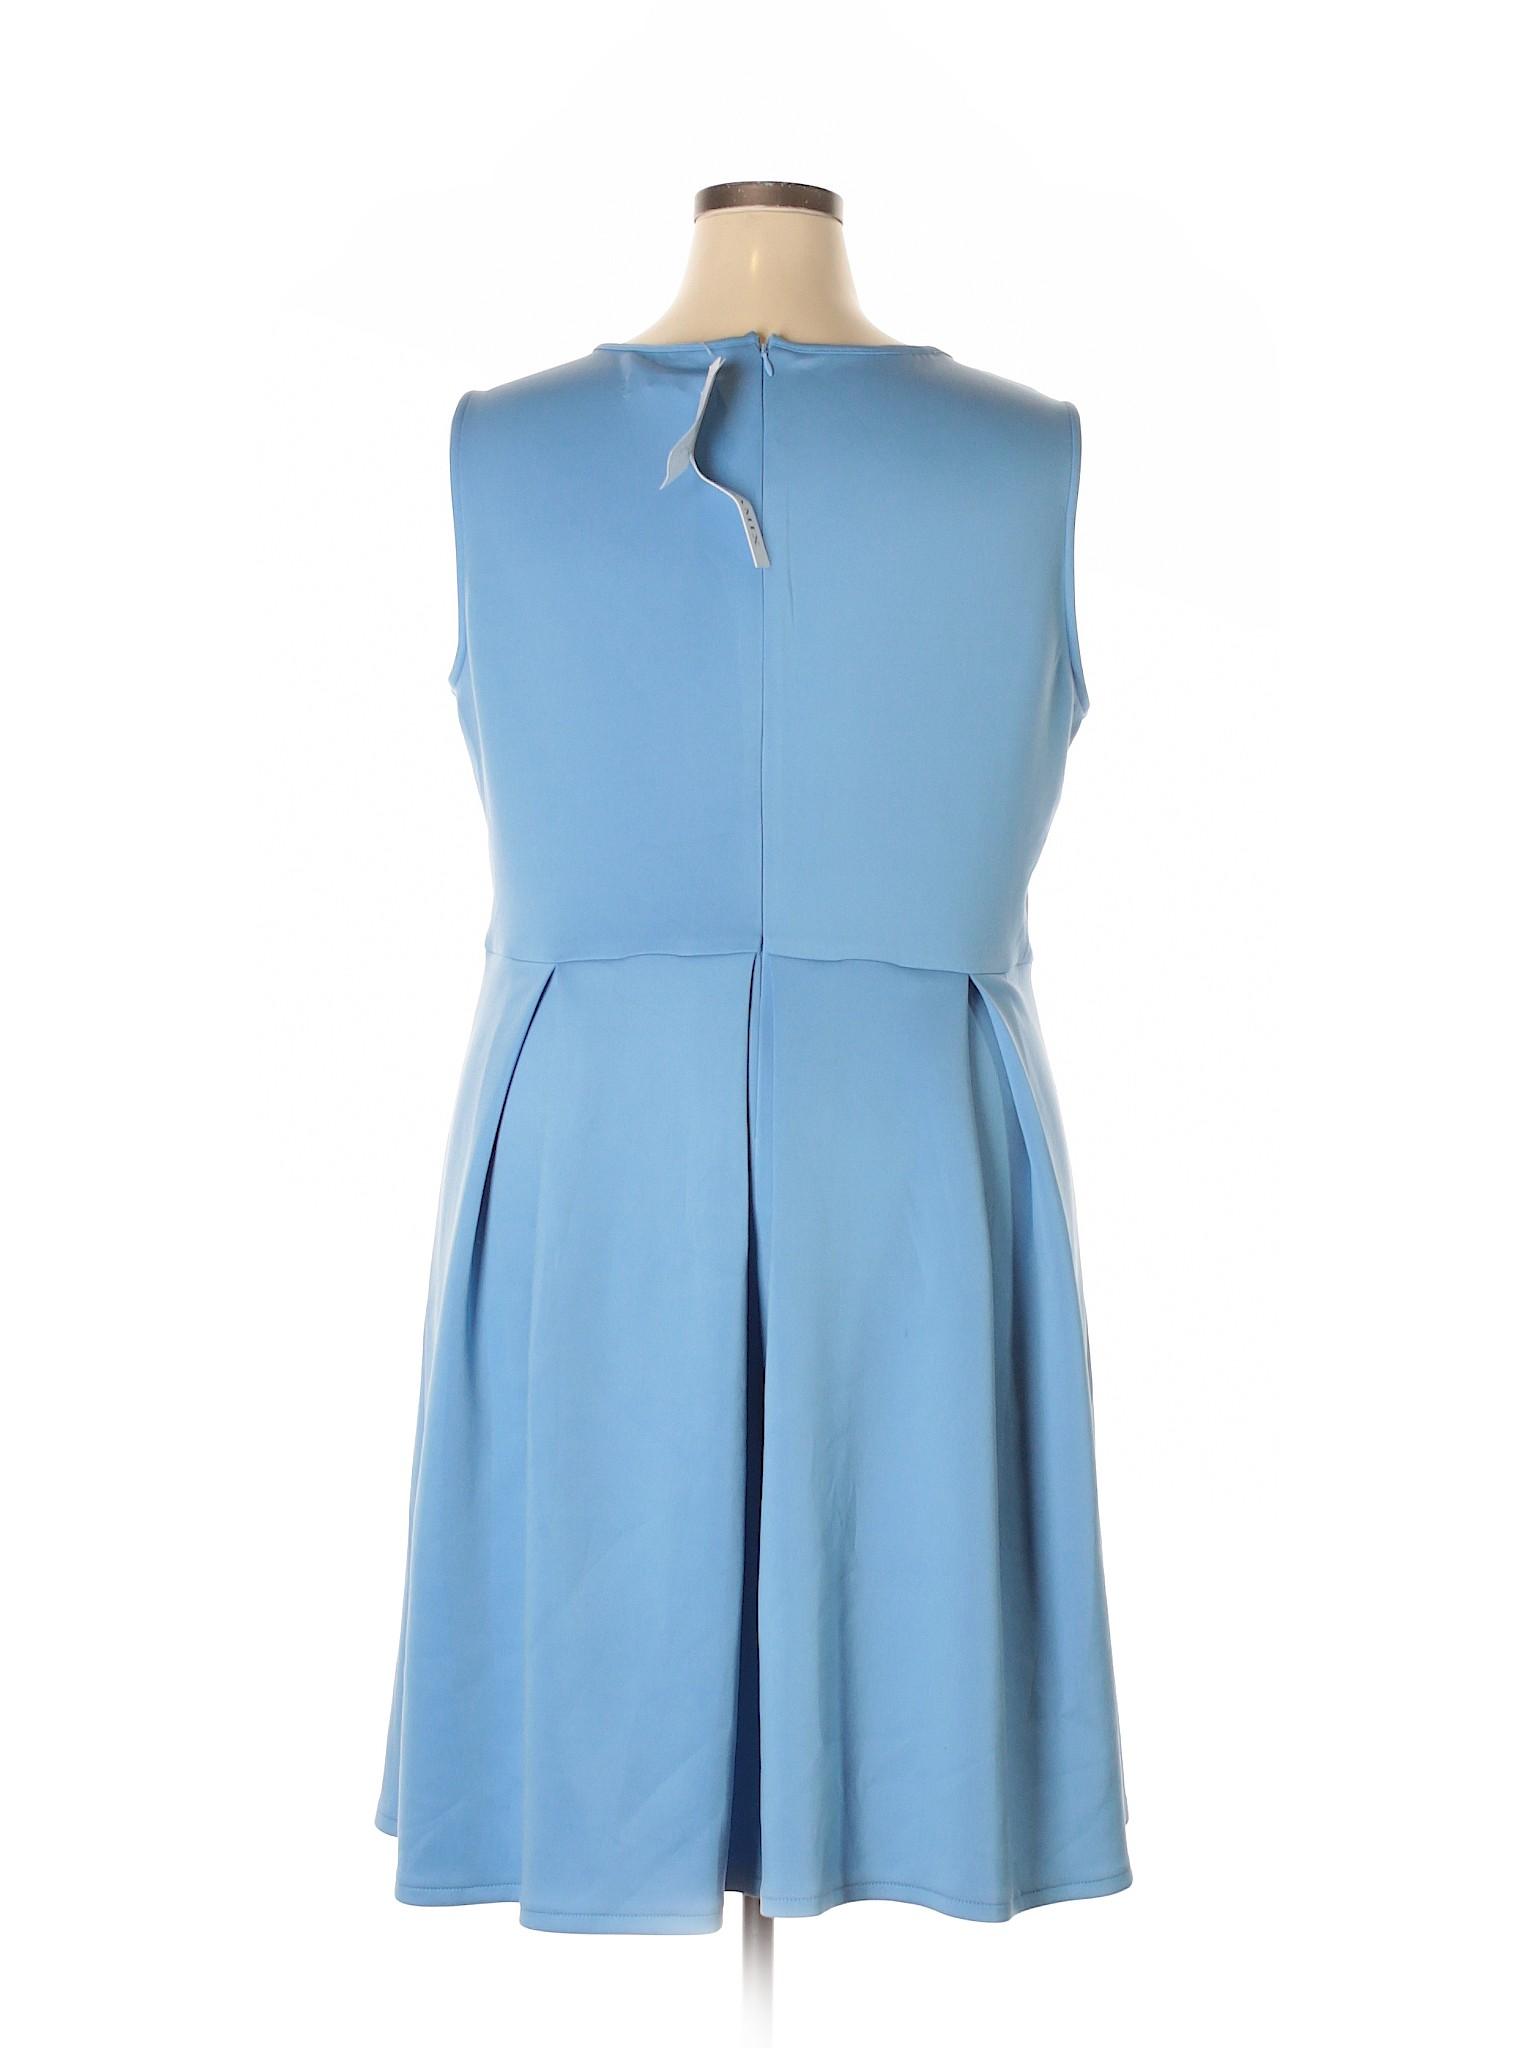 Modamix By Winter Brandon Casual Dress Thomas Boutique 5pqUc1TnU